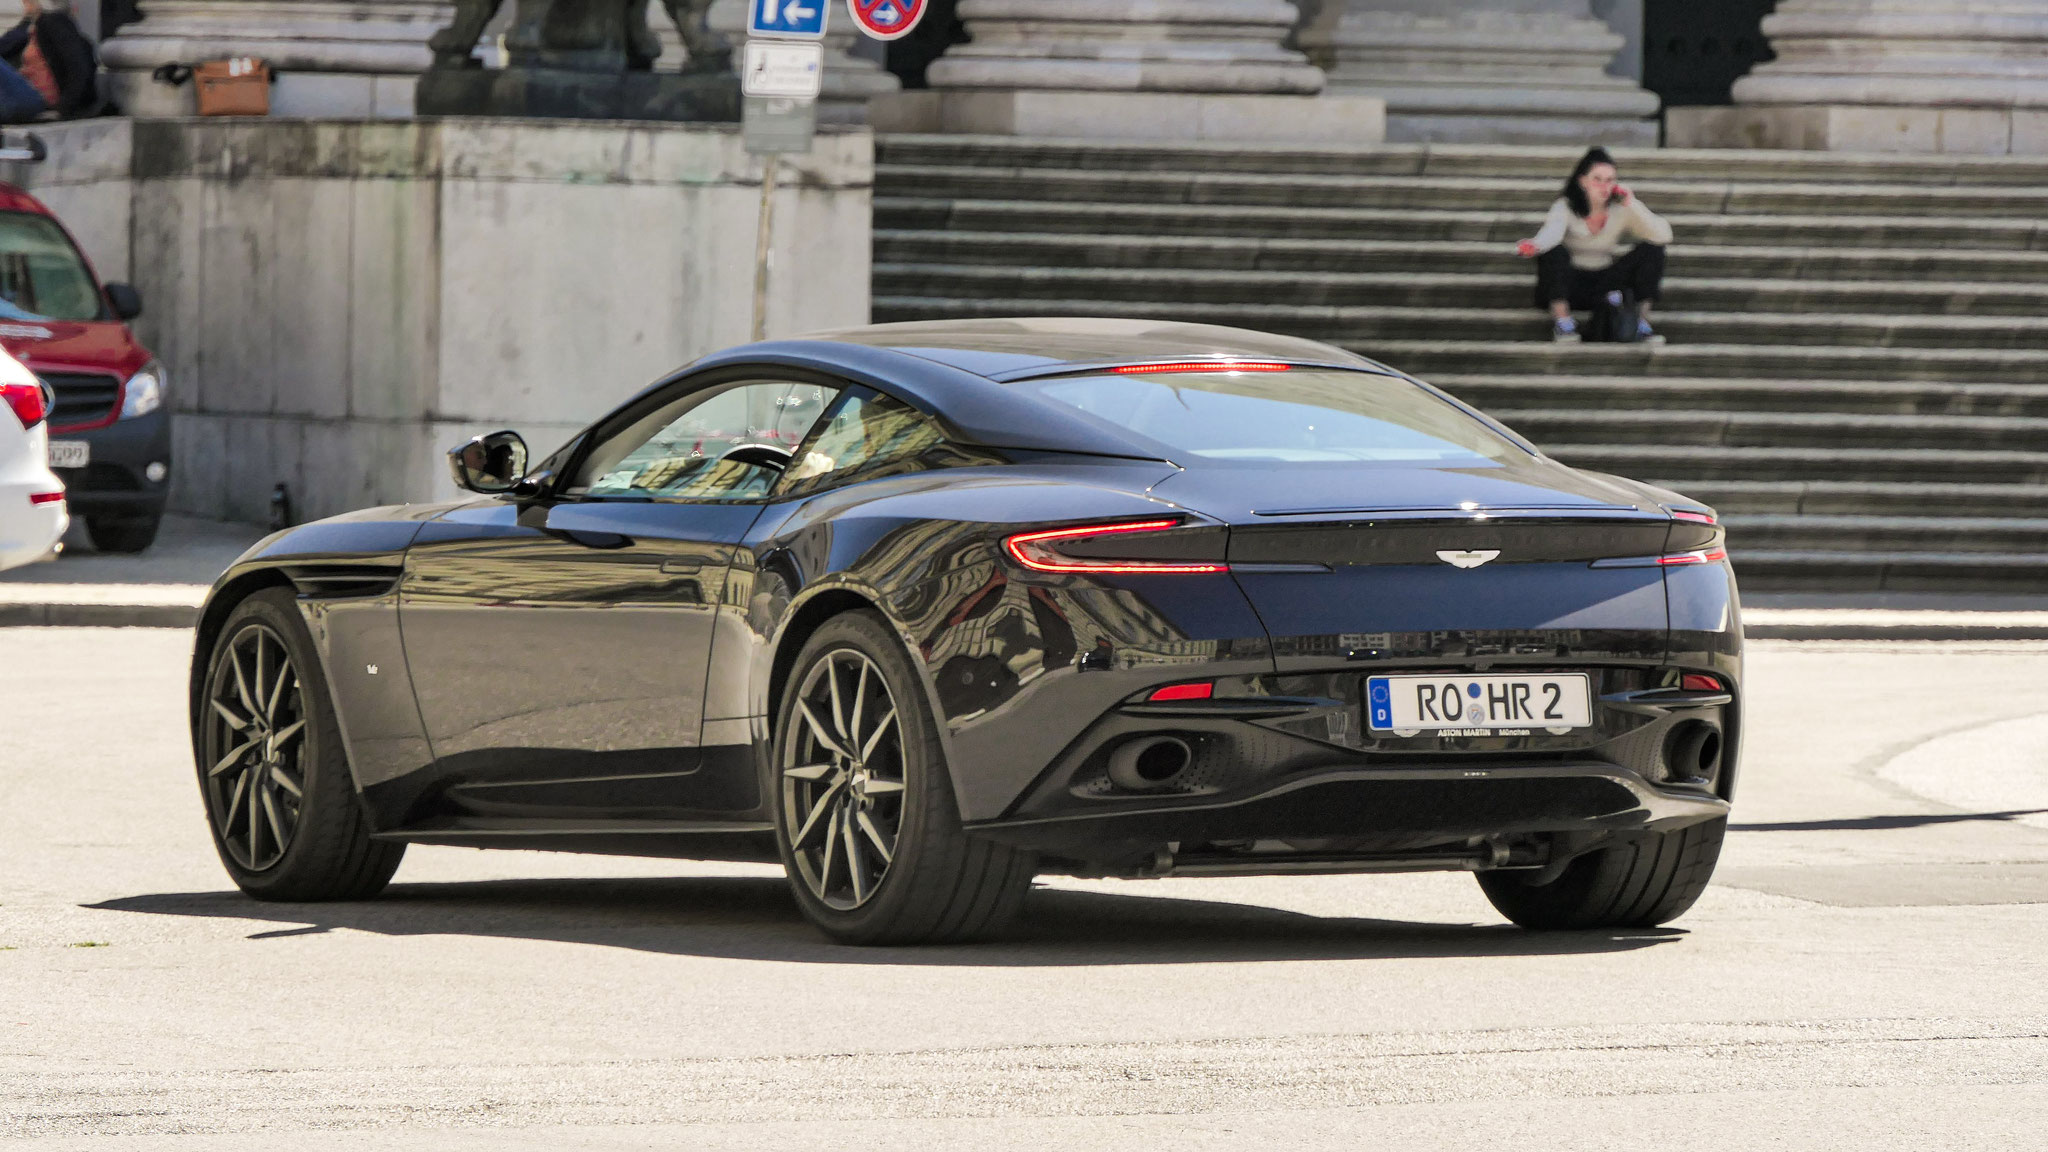 Aston Martin DB11 - RO-HR-2